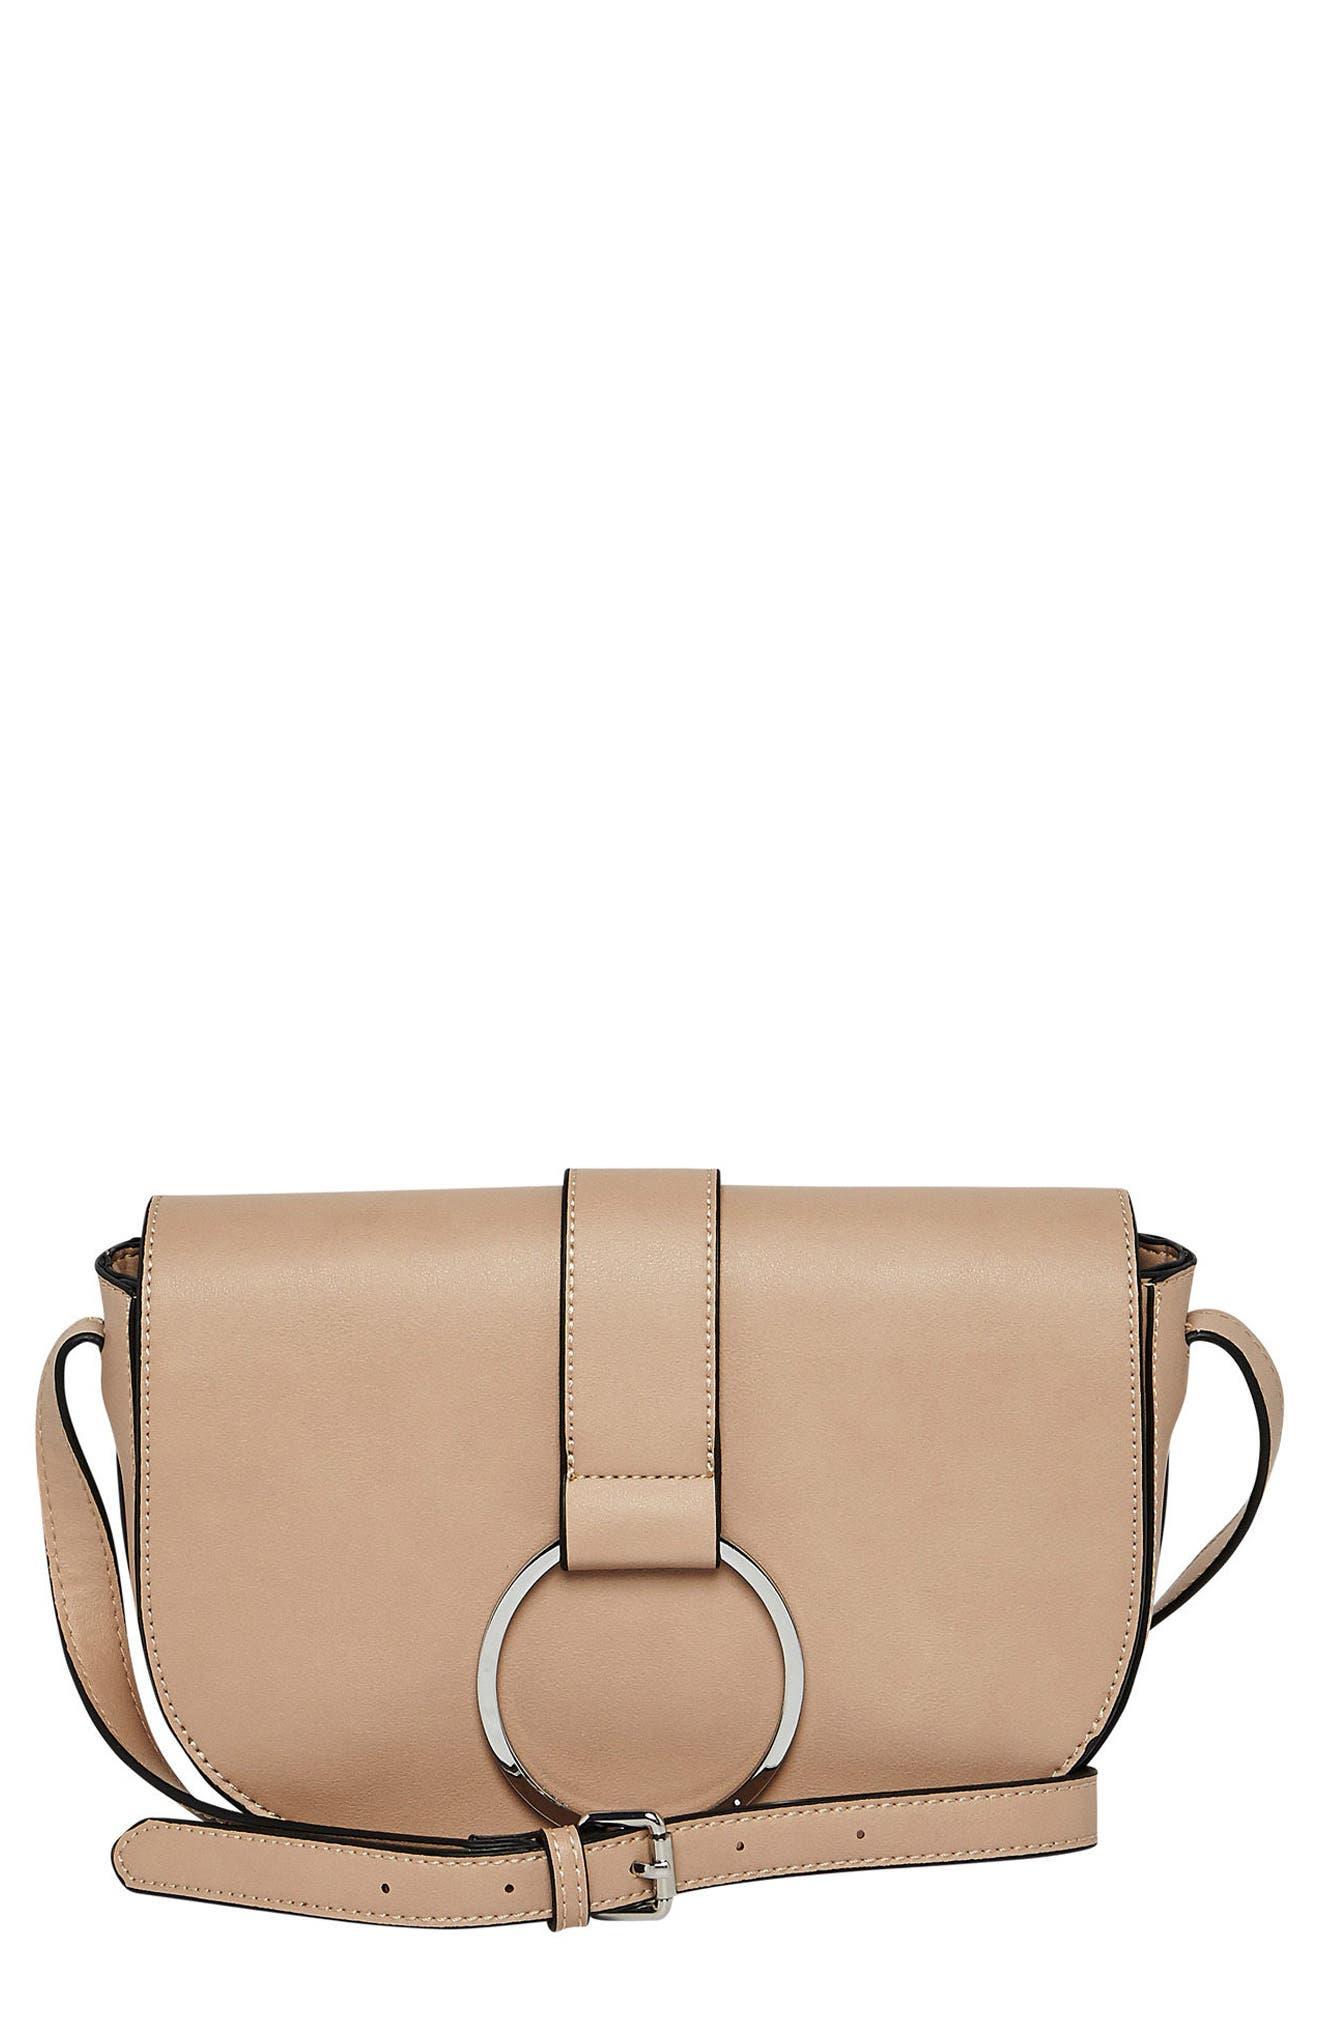 Lola Vegan Leather Crossbody Saddle Bag,                             Main thumbnail 1, color,                             PINK